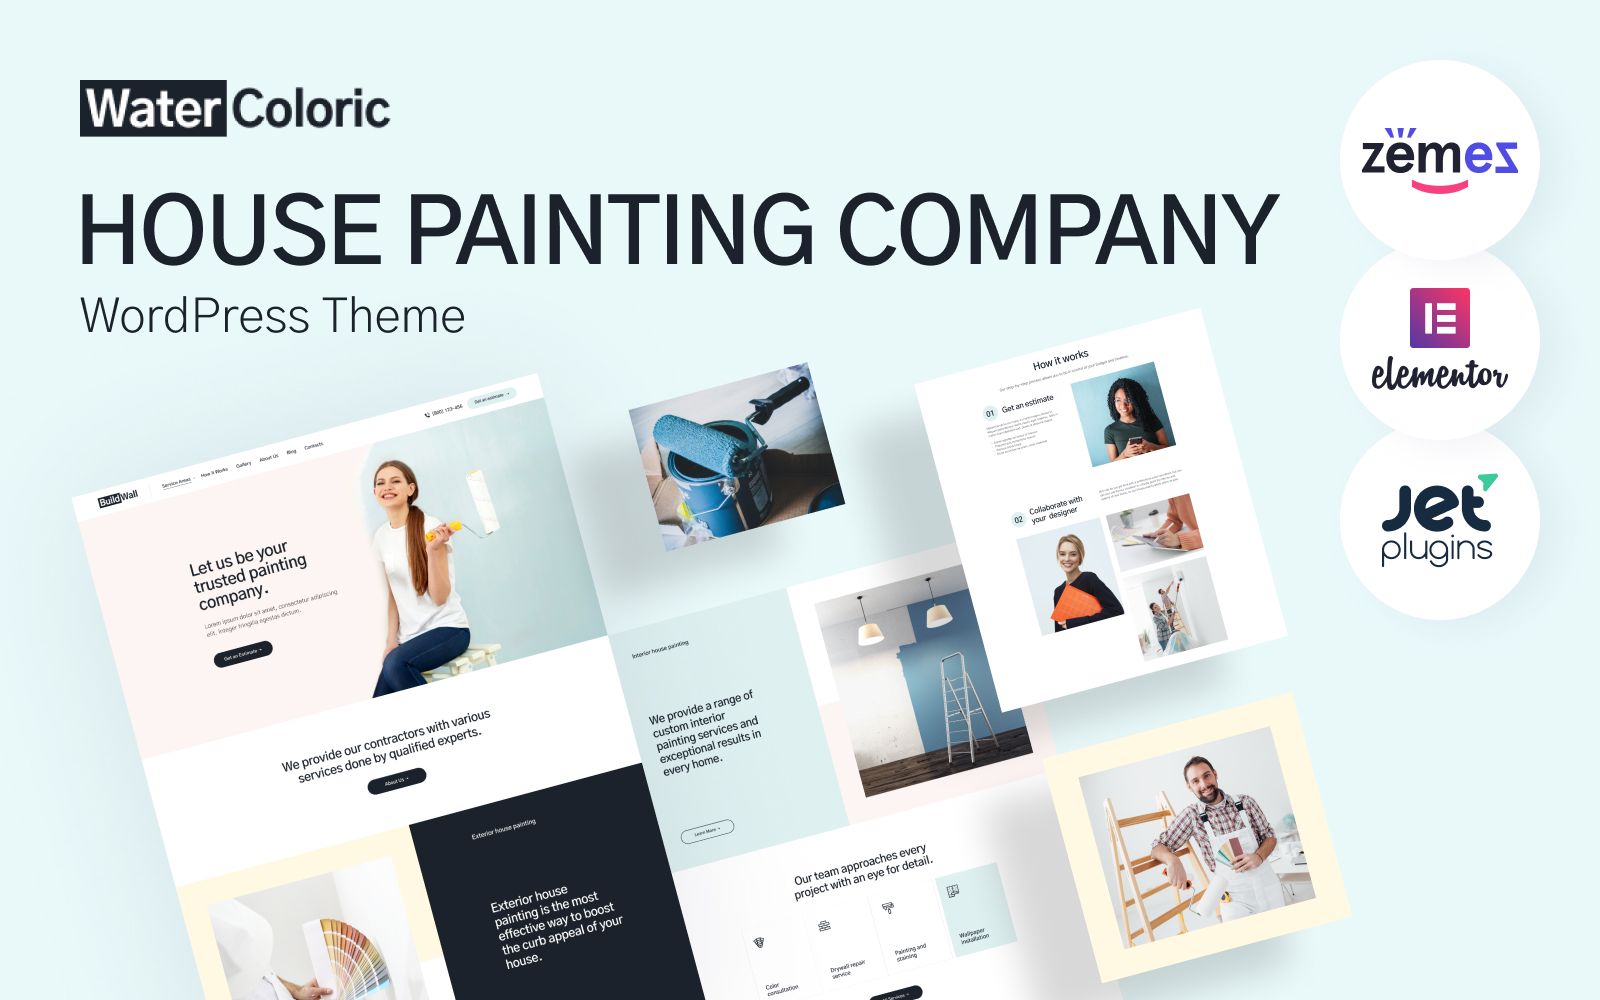 Reszponzív WaterColoric - House Painting Company WordPress sablon 114815